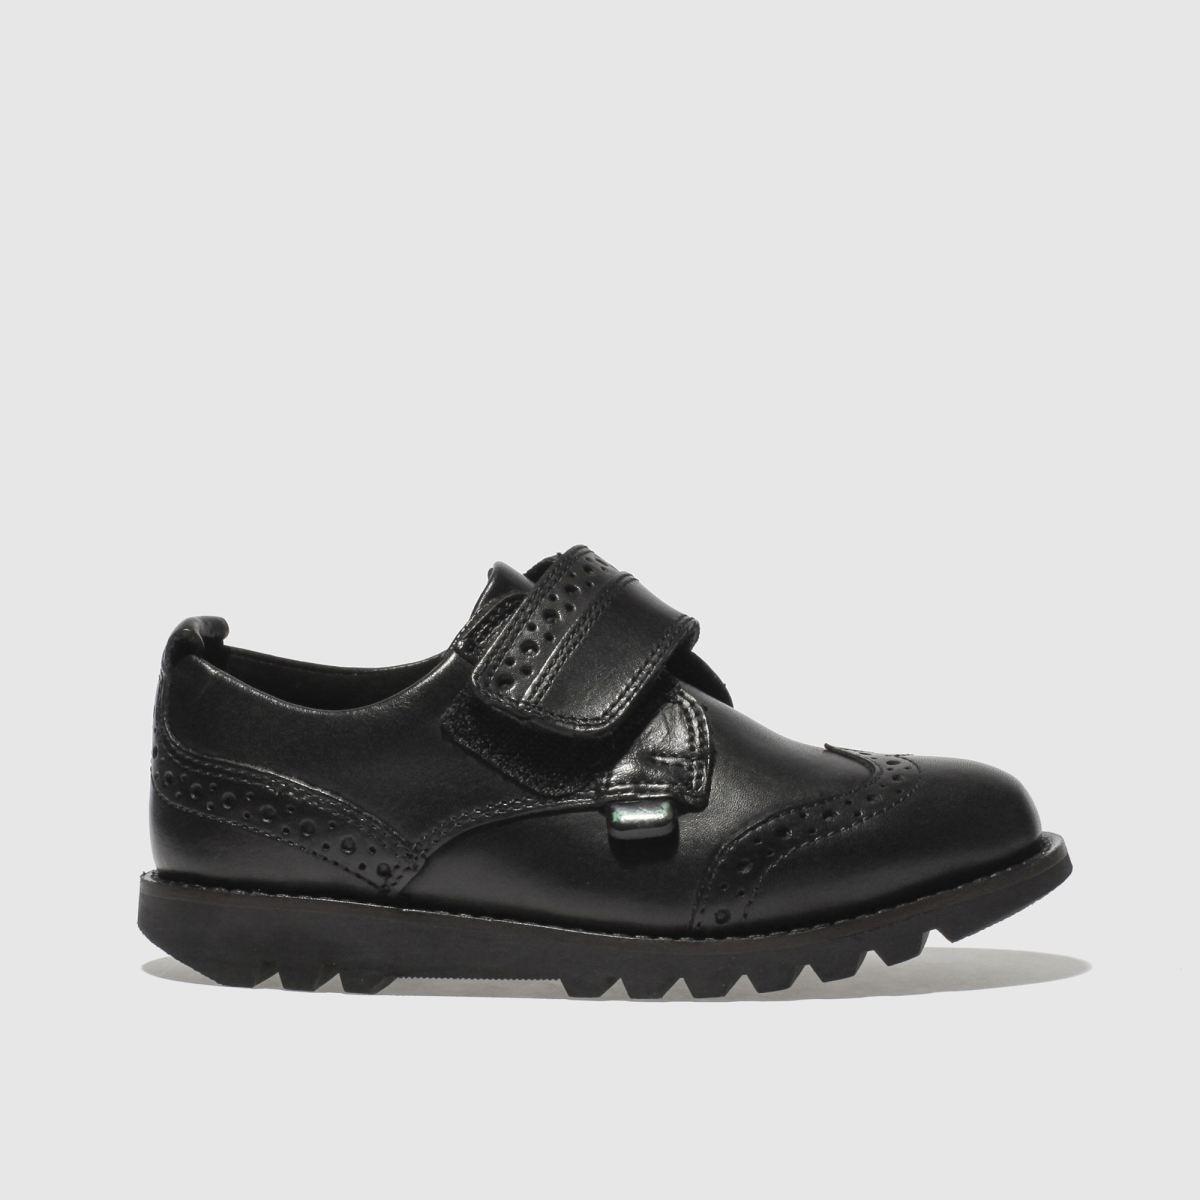 Kickers Black Kymbo Brogue Strap Boys Toddler Shoes